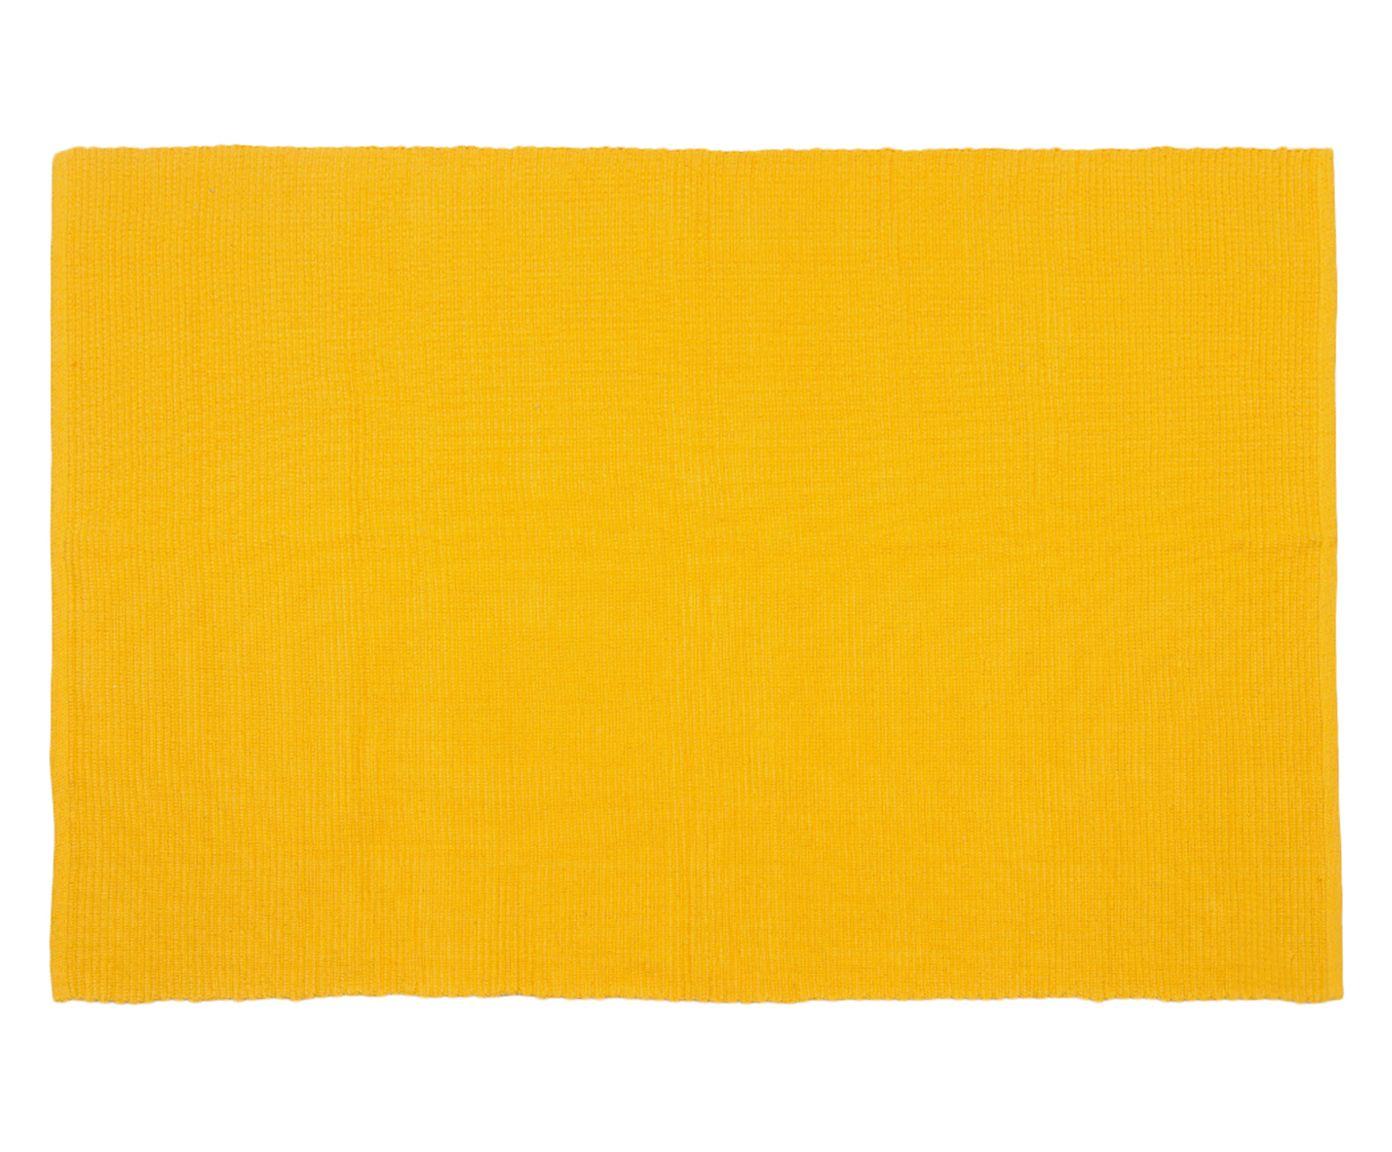 Tapete Indiano Mahavidya Amarelo - 120x180cm | Westwing.com.br